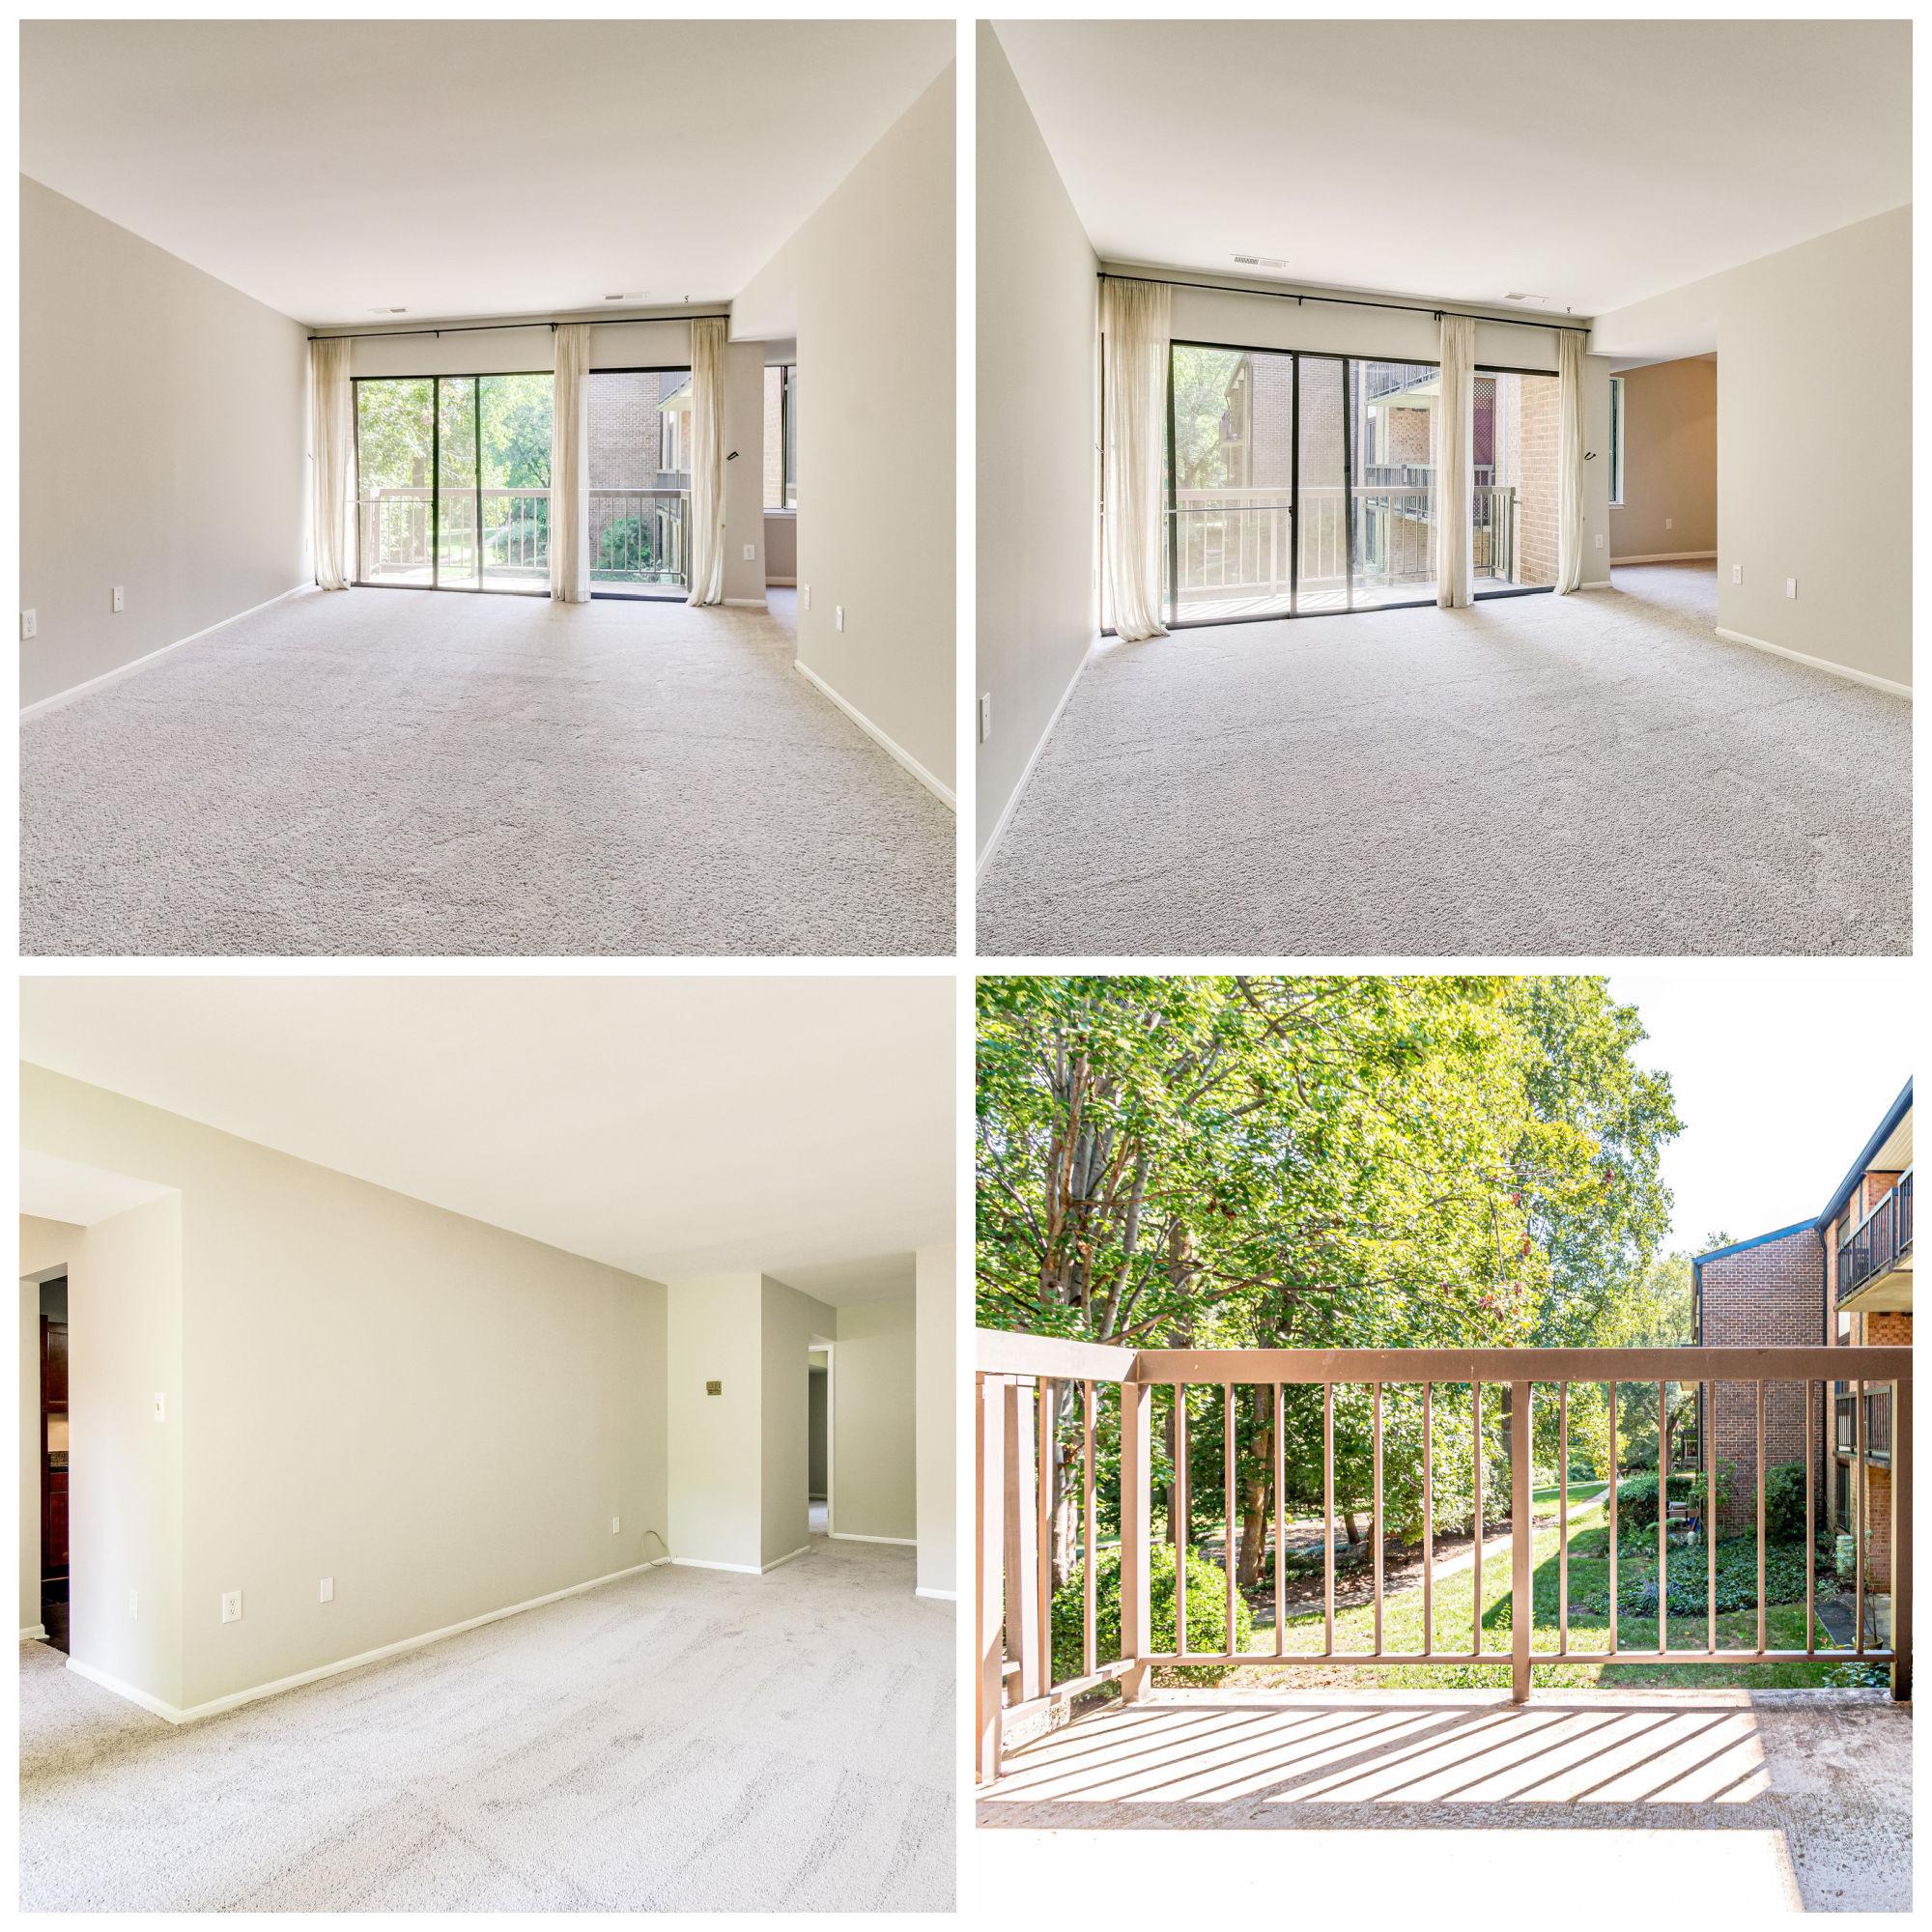 9810 Kingsbridge Dr #102, Fairfax- Living Room and Balcony